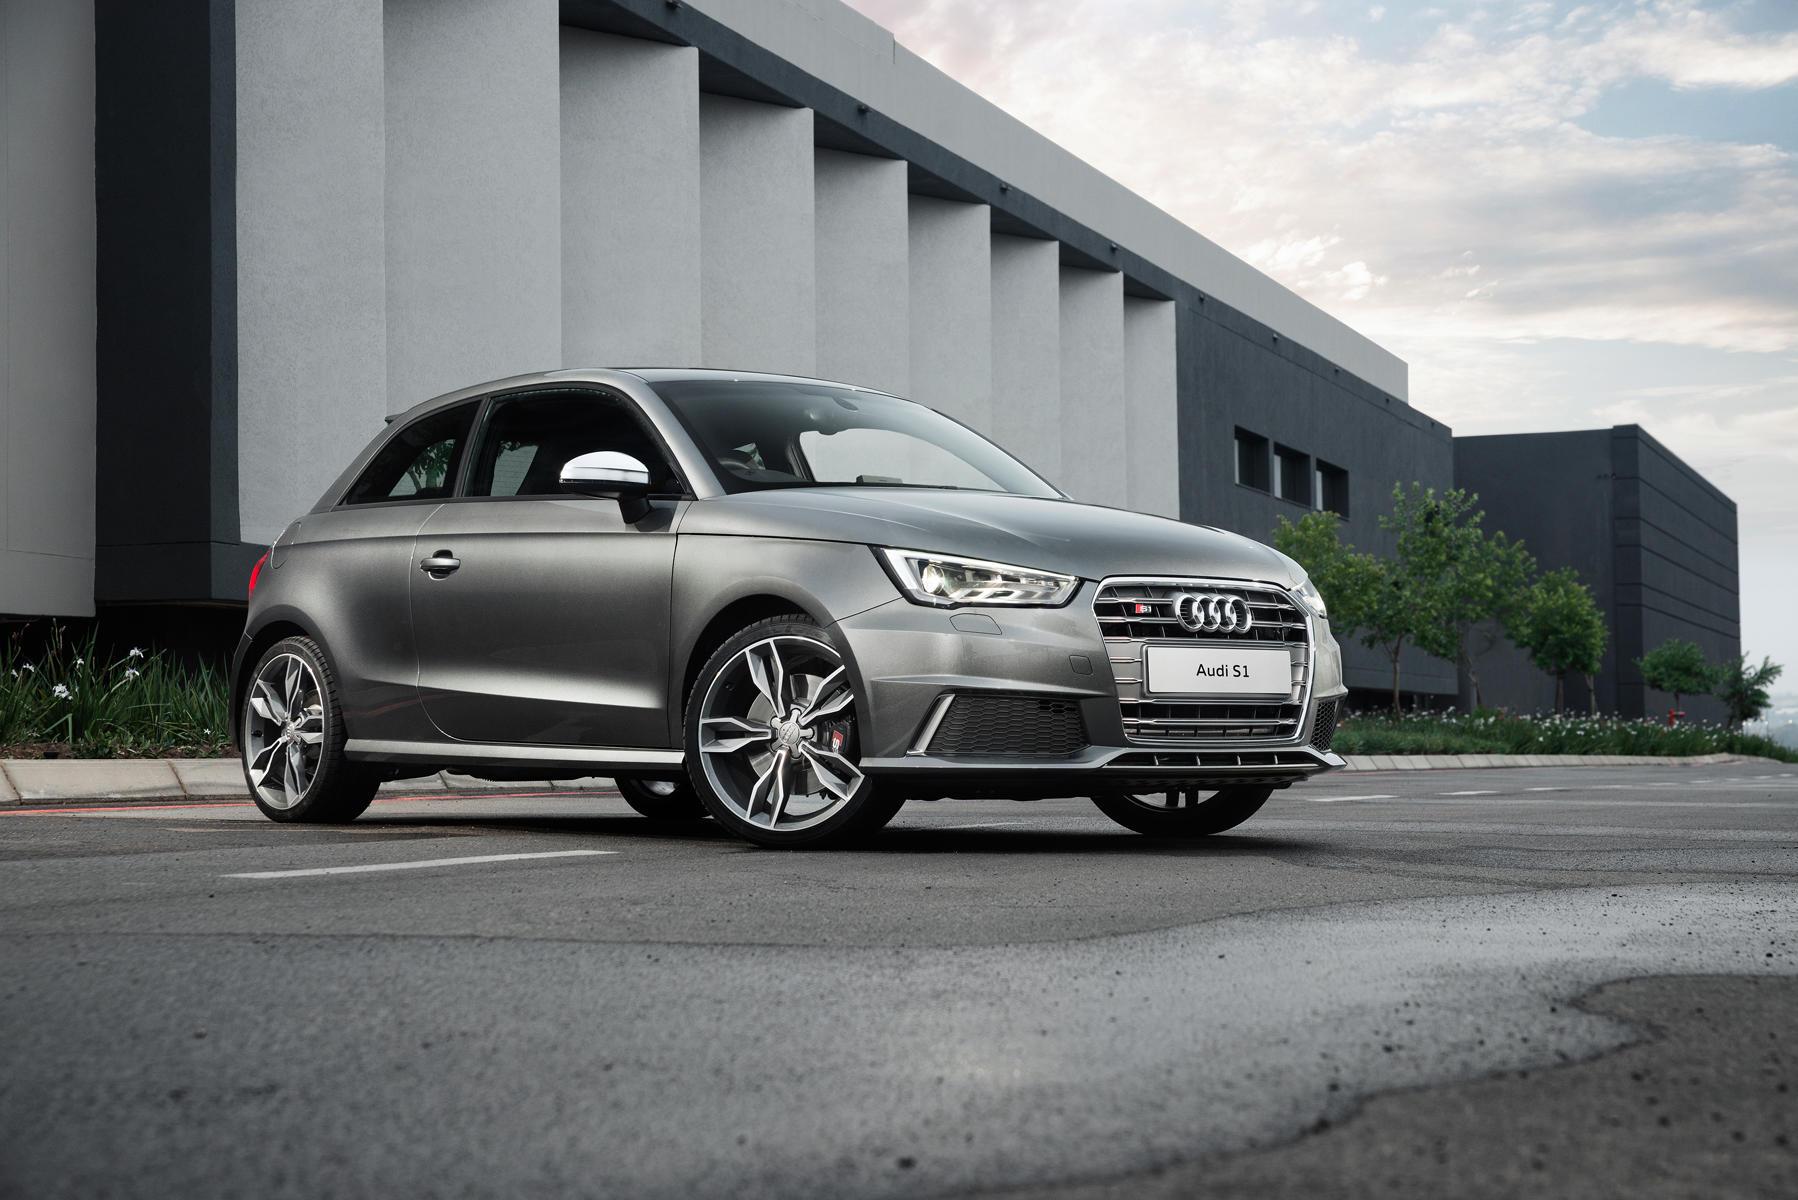 11_Audi S1_72 dpi